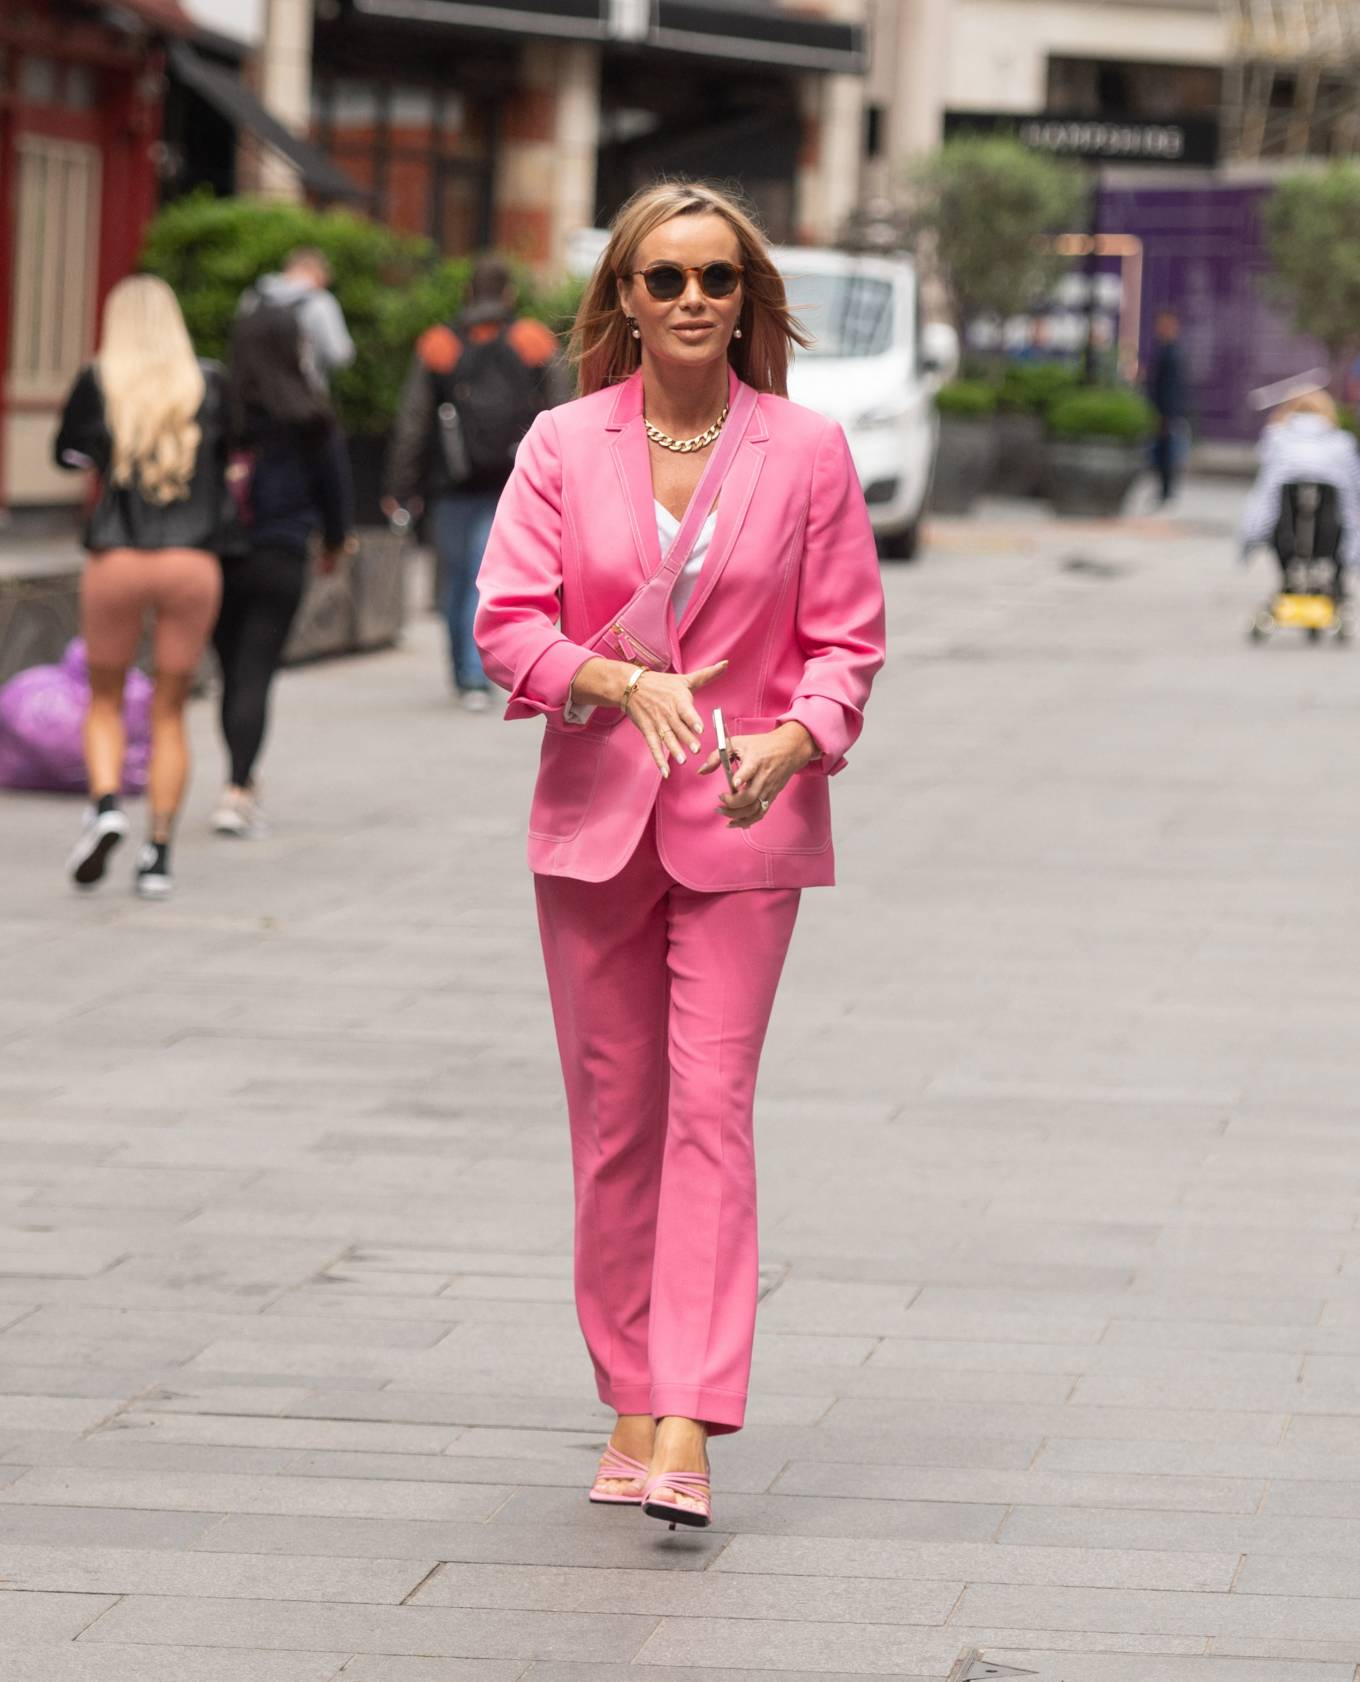 Amanda Holden - In pink seen at Global Radio in London